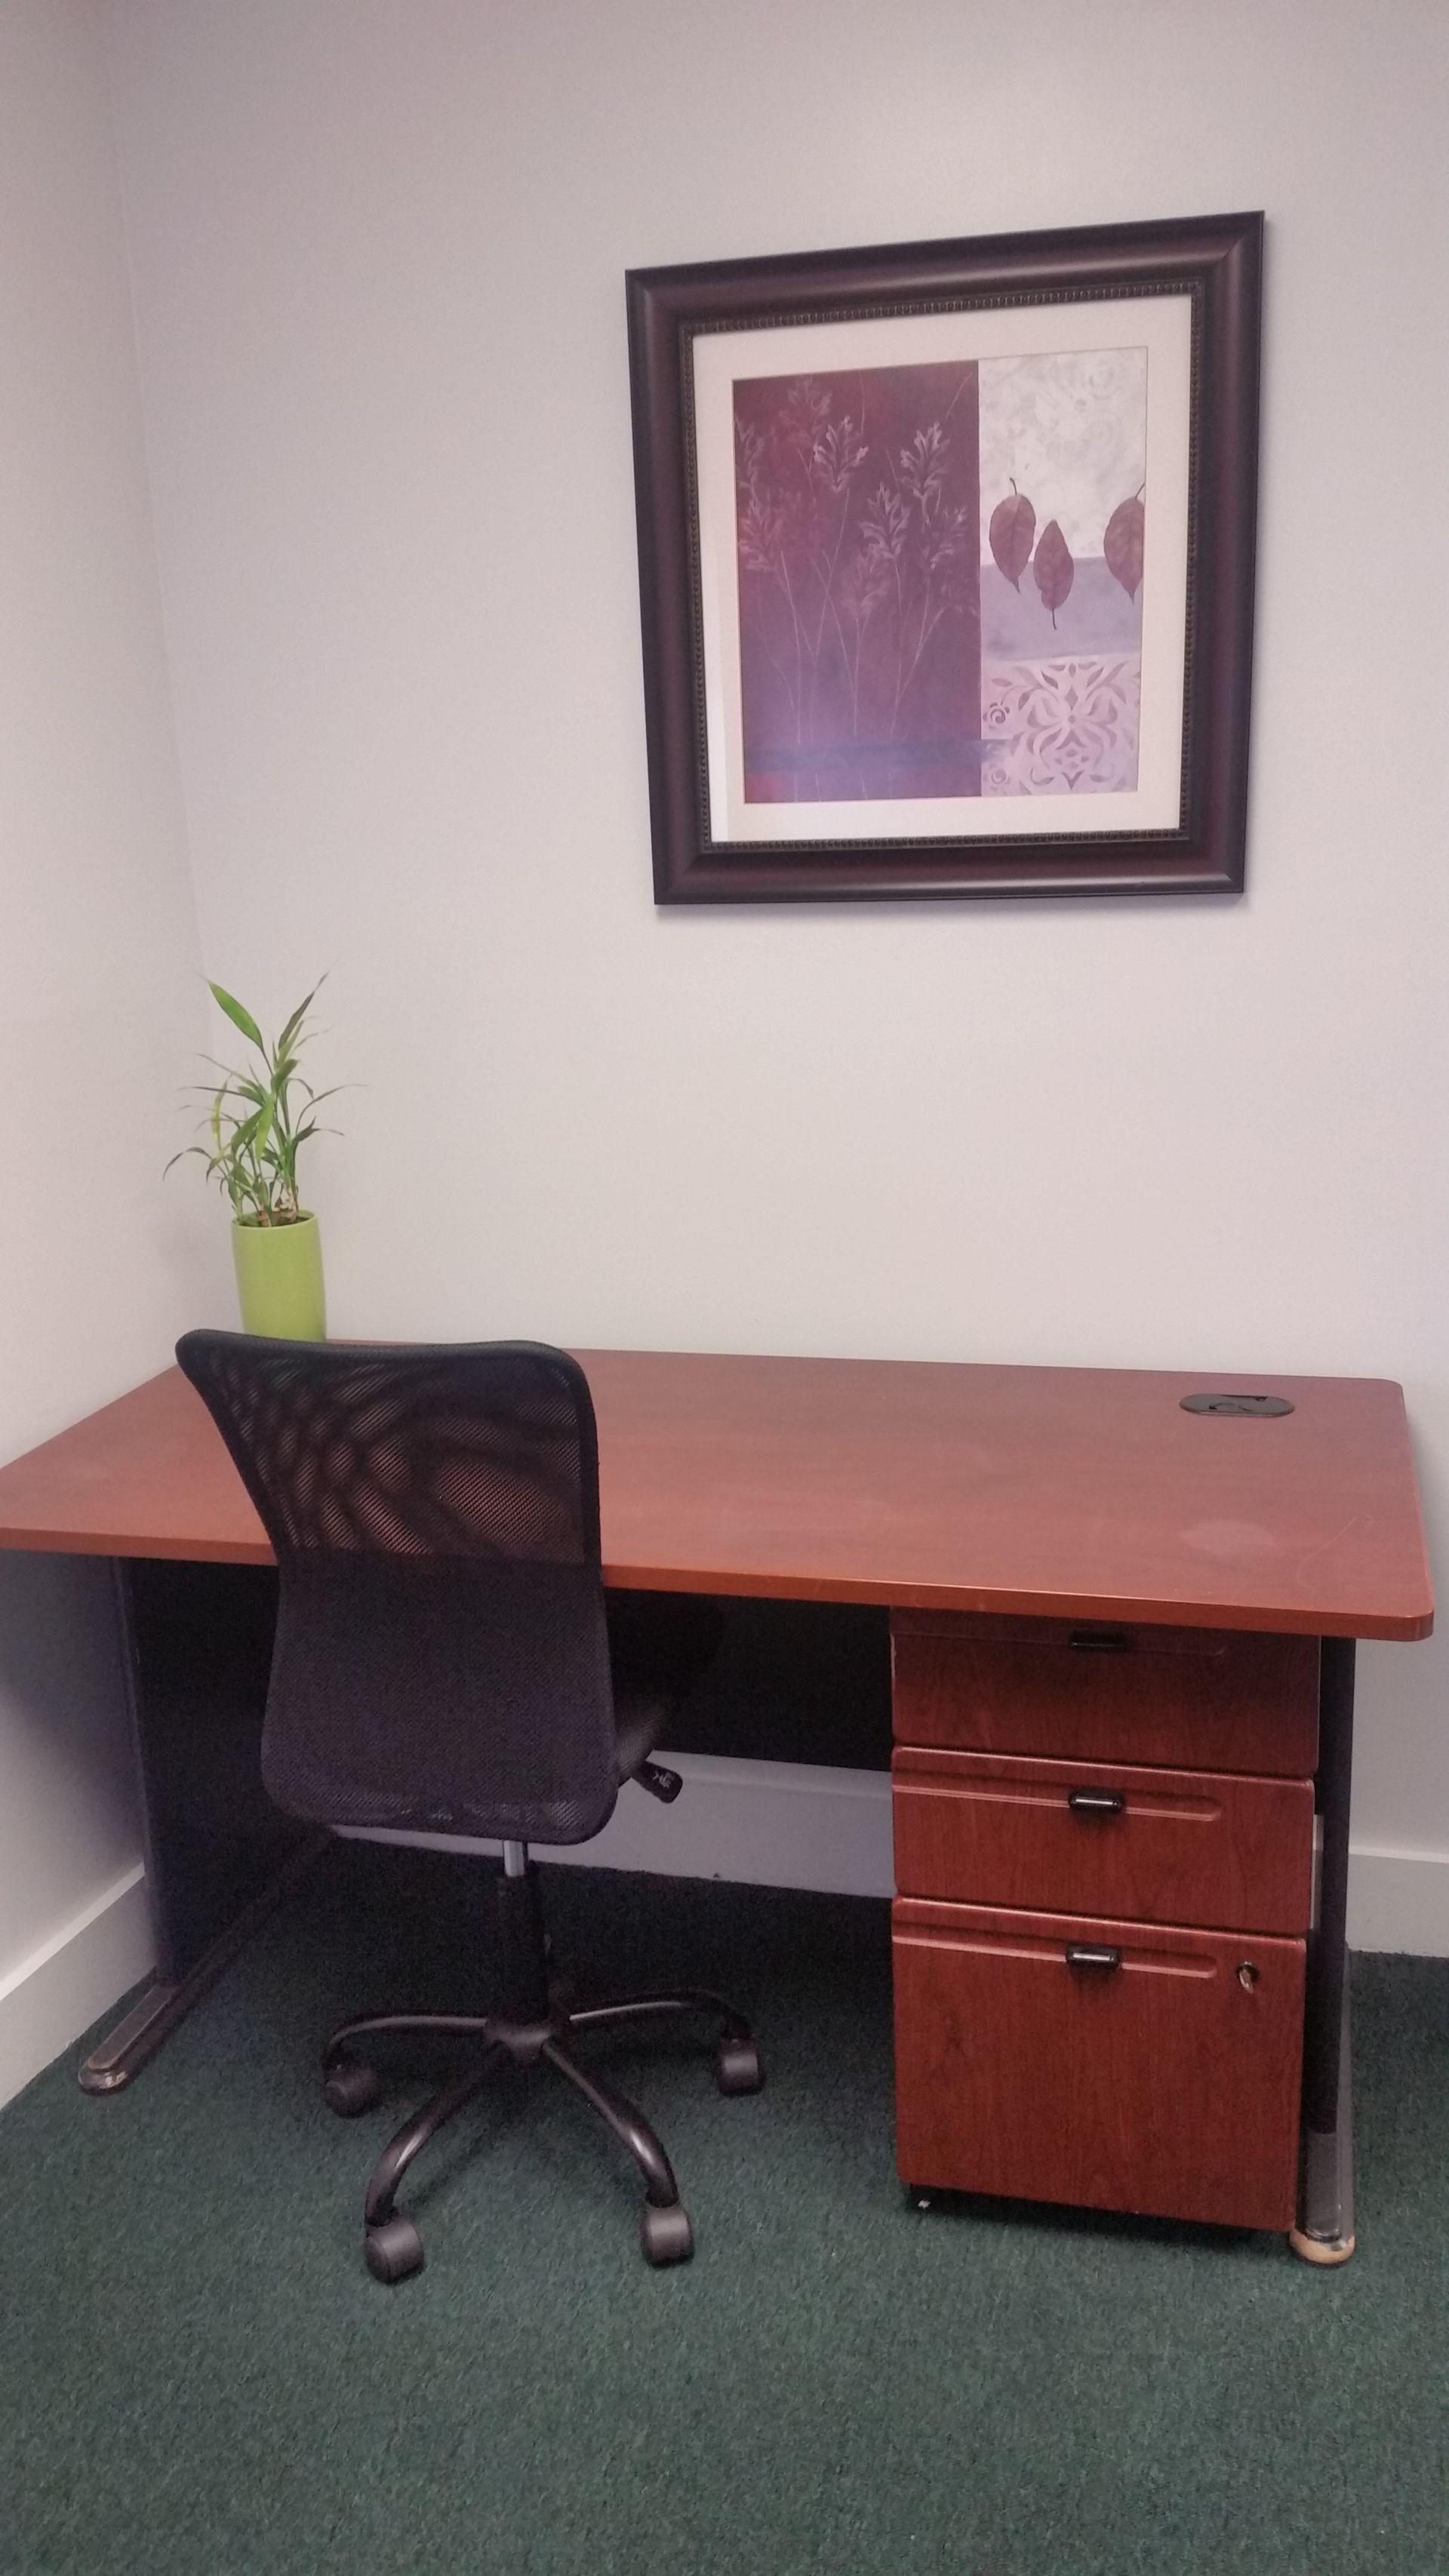 Sybil Property Co-Work & Business Center, Carmel Hamlet